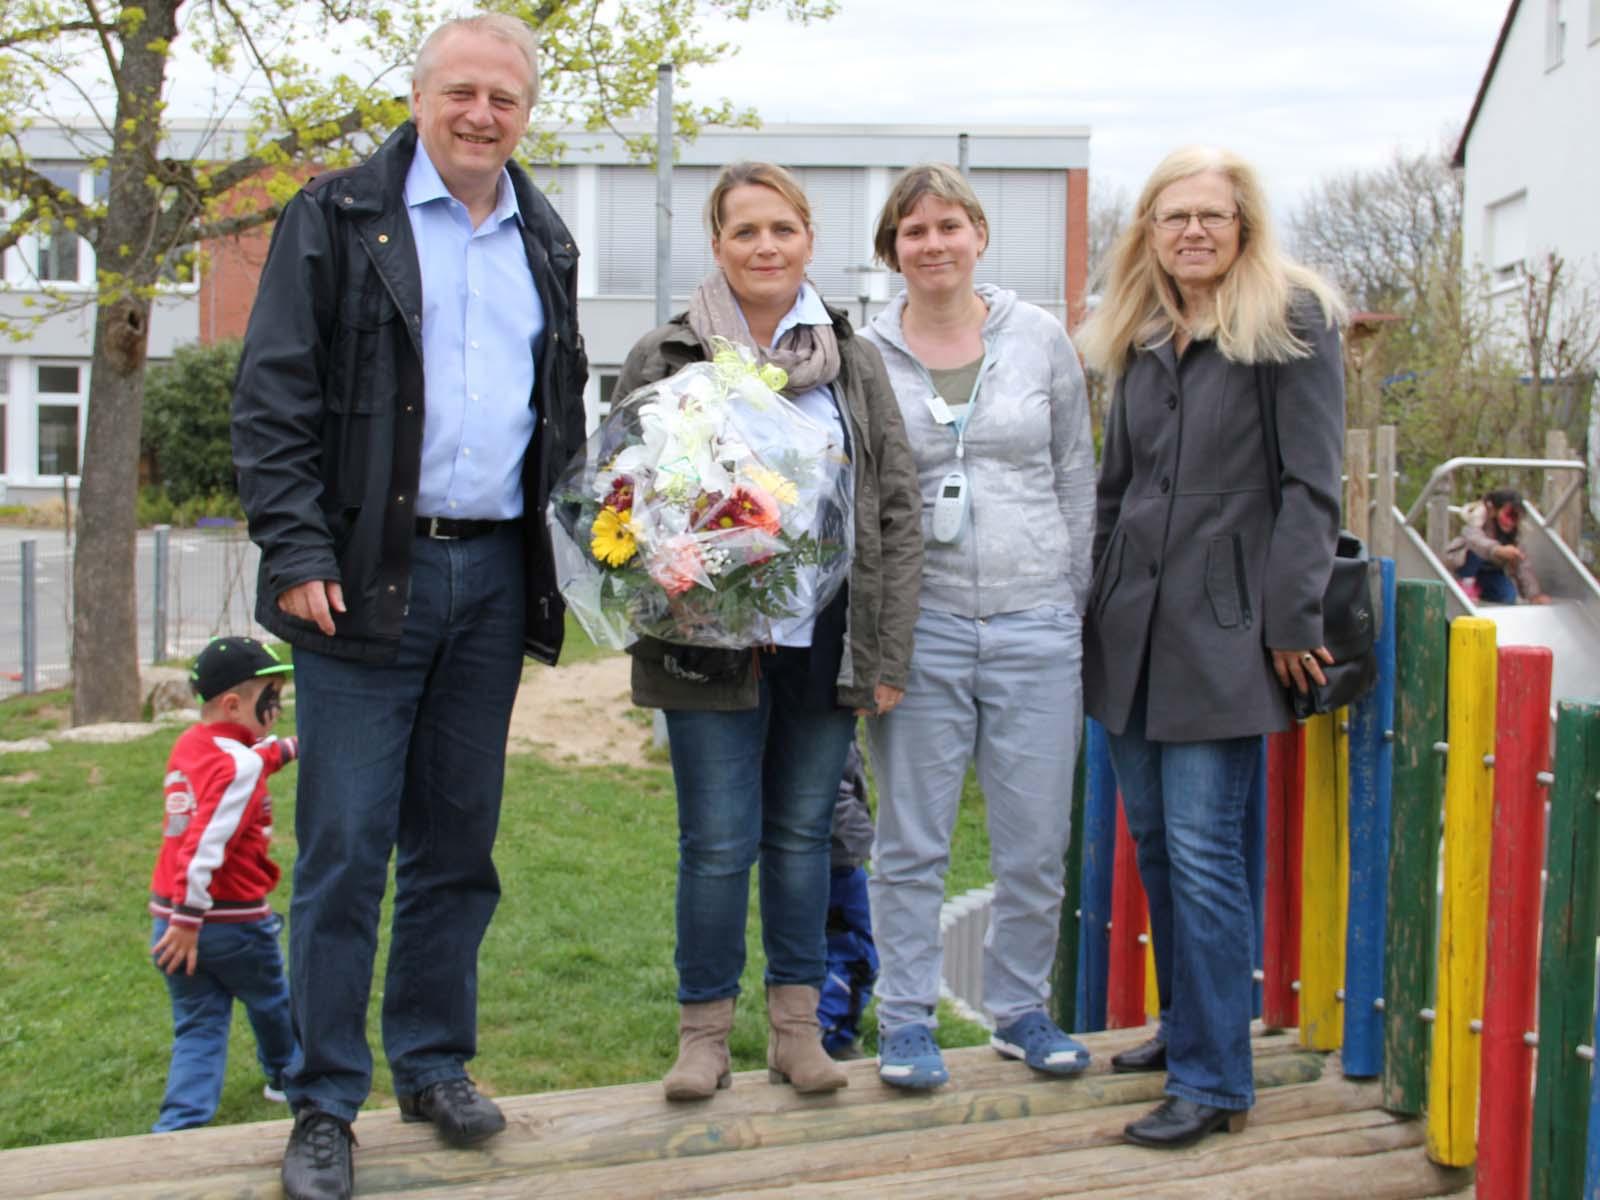 V.l.: BM Wolfgang Lahl, Sabine Jauß, Imke Krämer, Helga Wolff